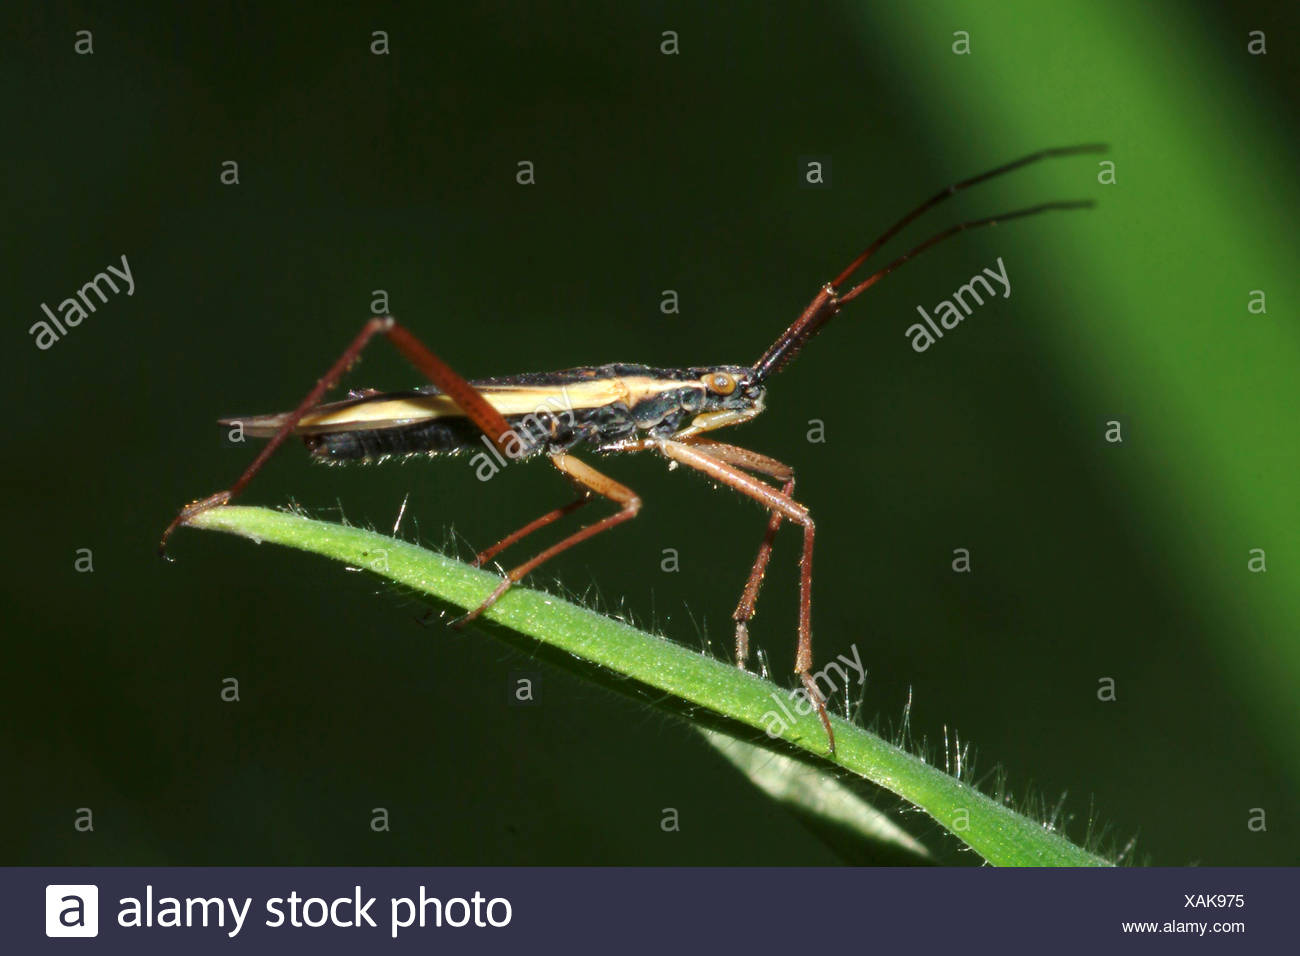 capsid bug (Notostira spec.), sitting on a leaf, Germany - Stock Image